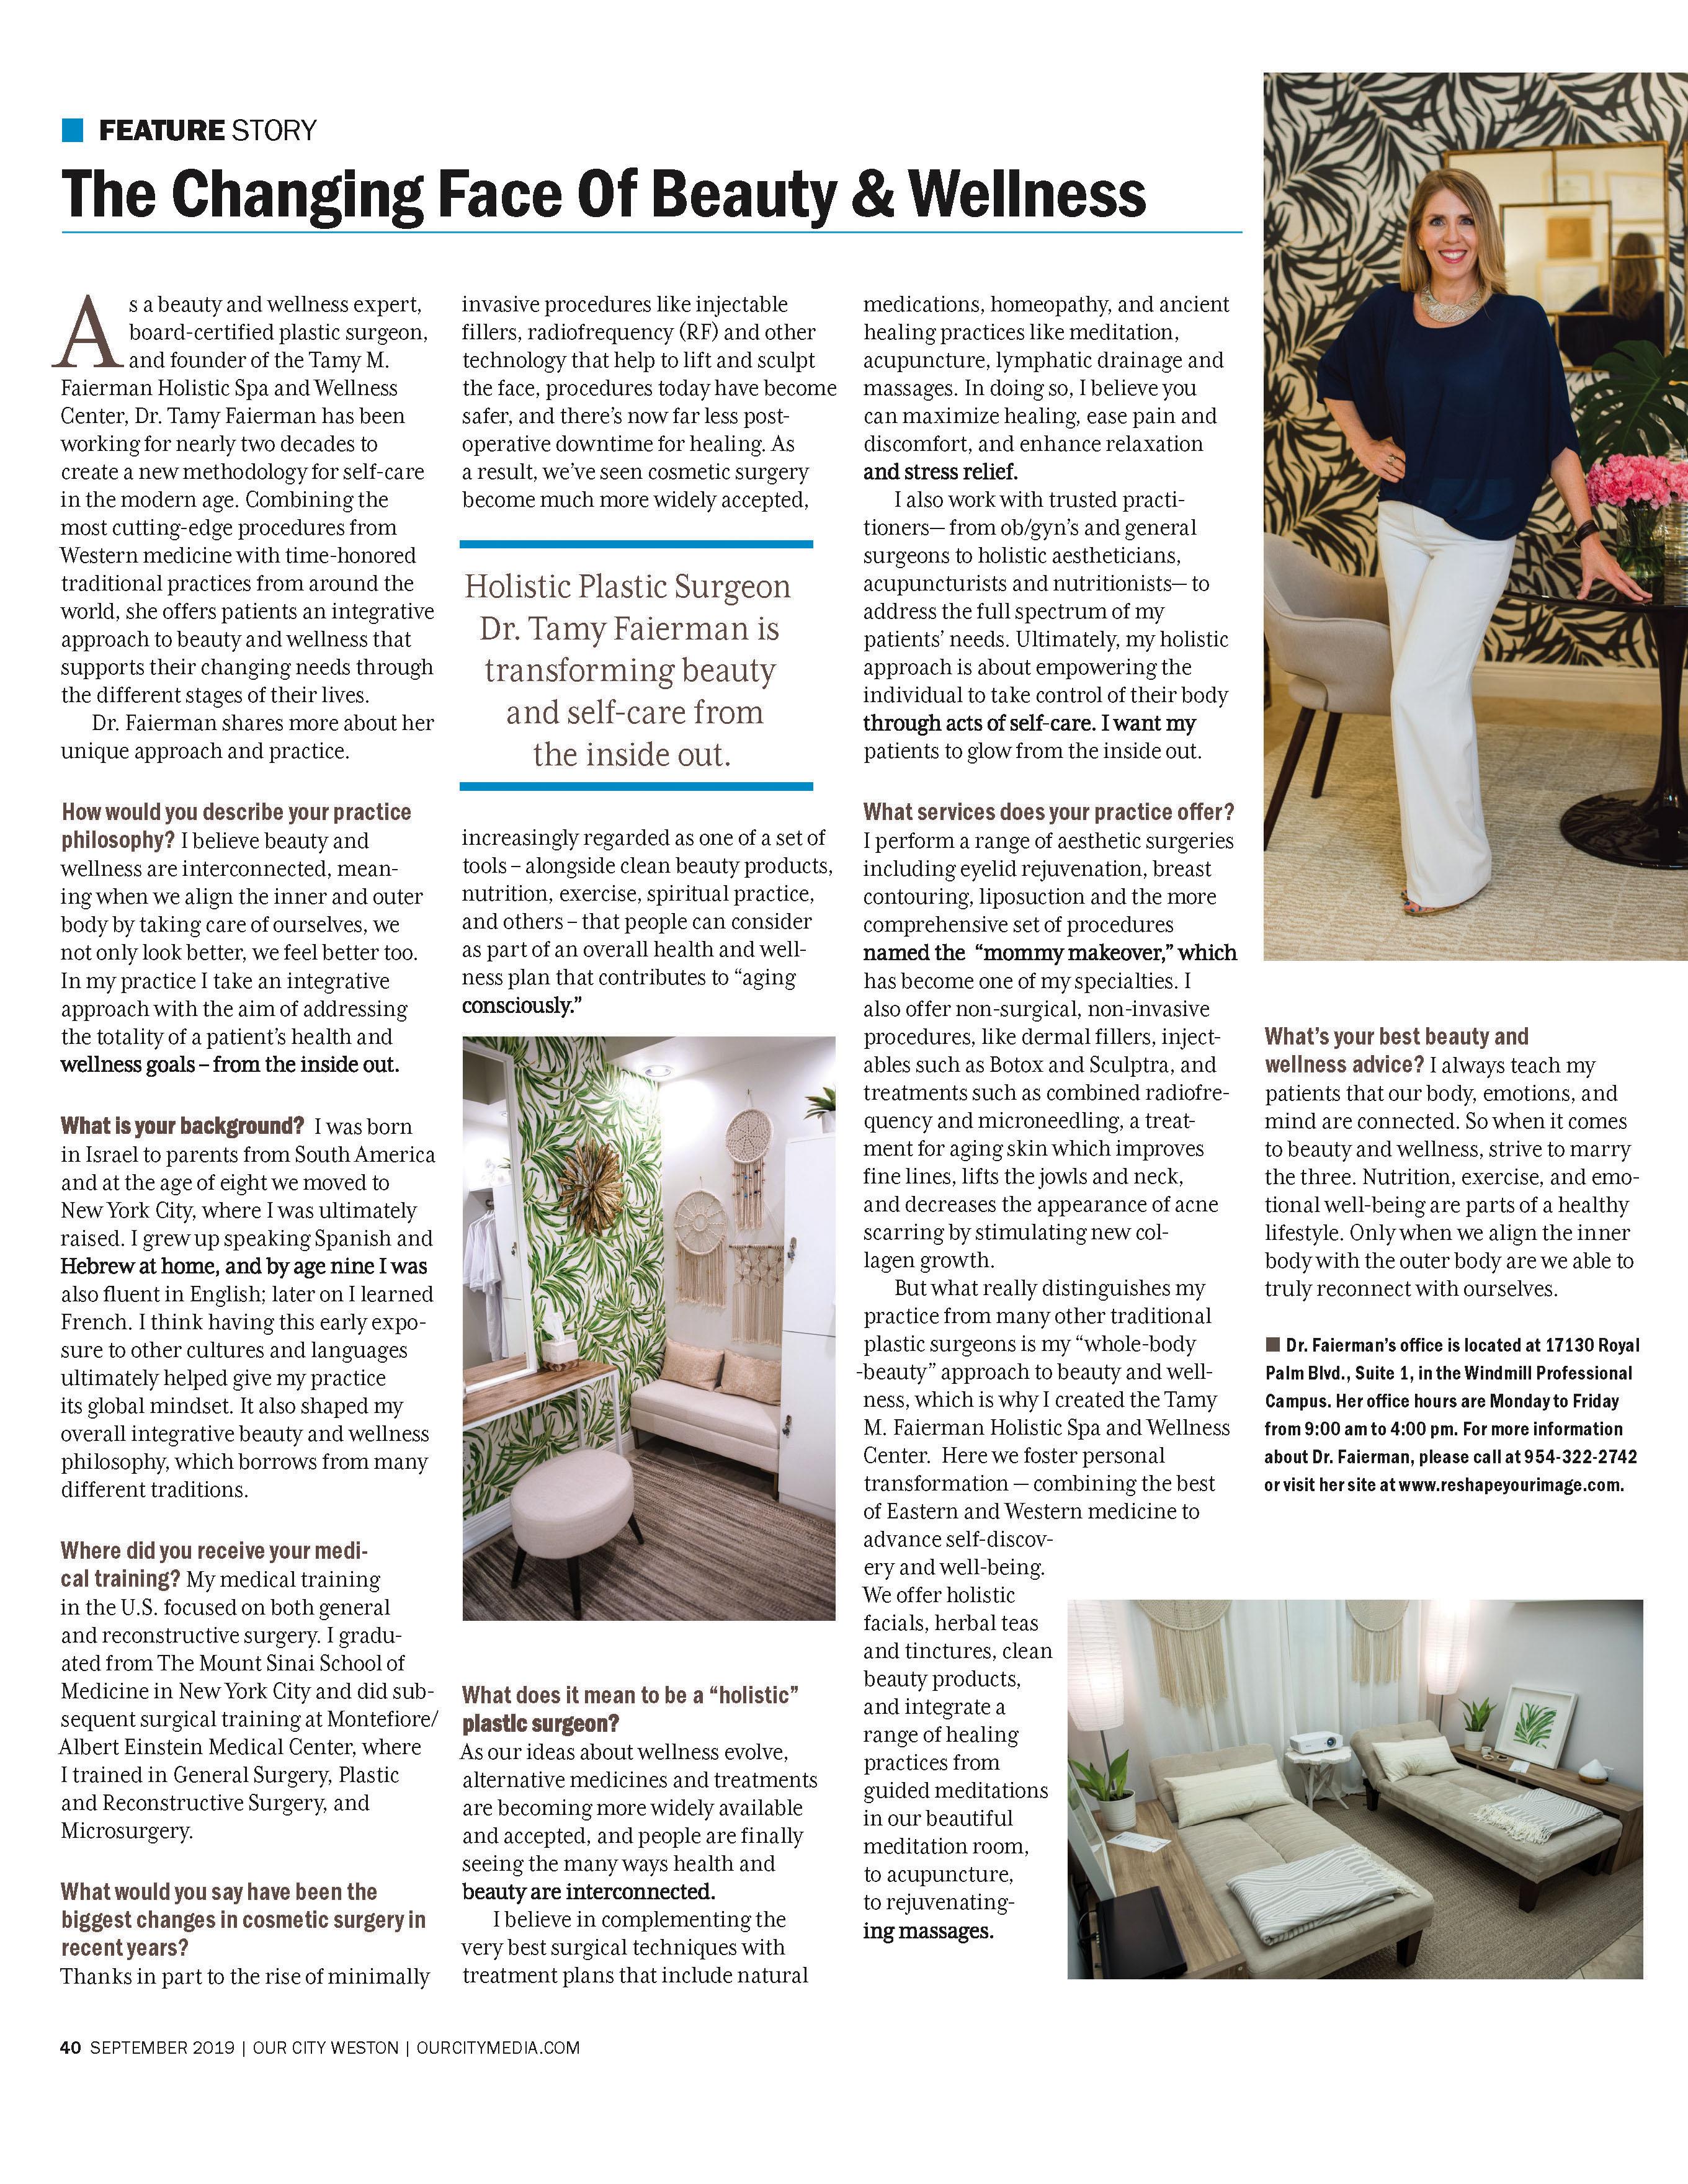 Our City Weston Magazine - Tamy M Faierman